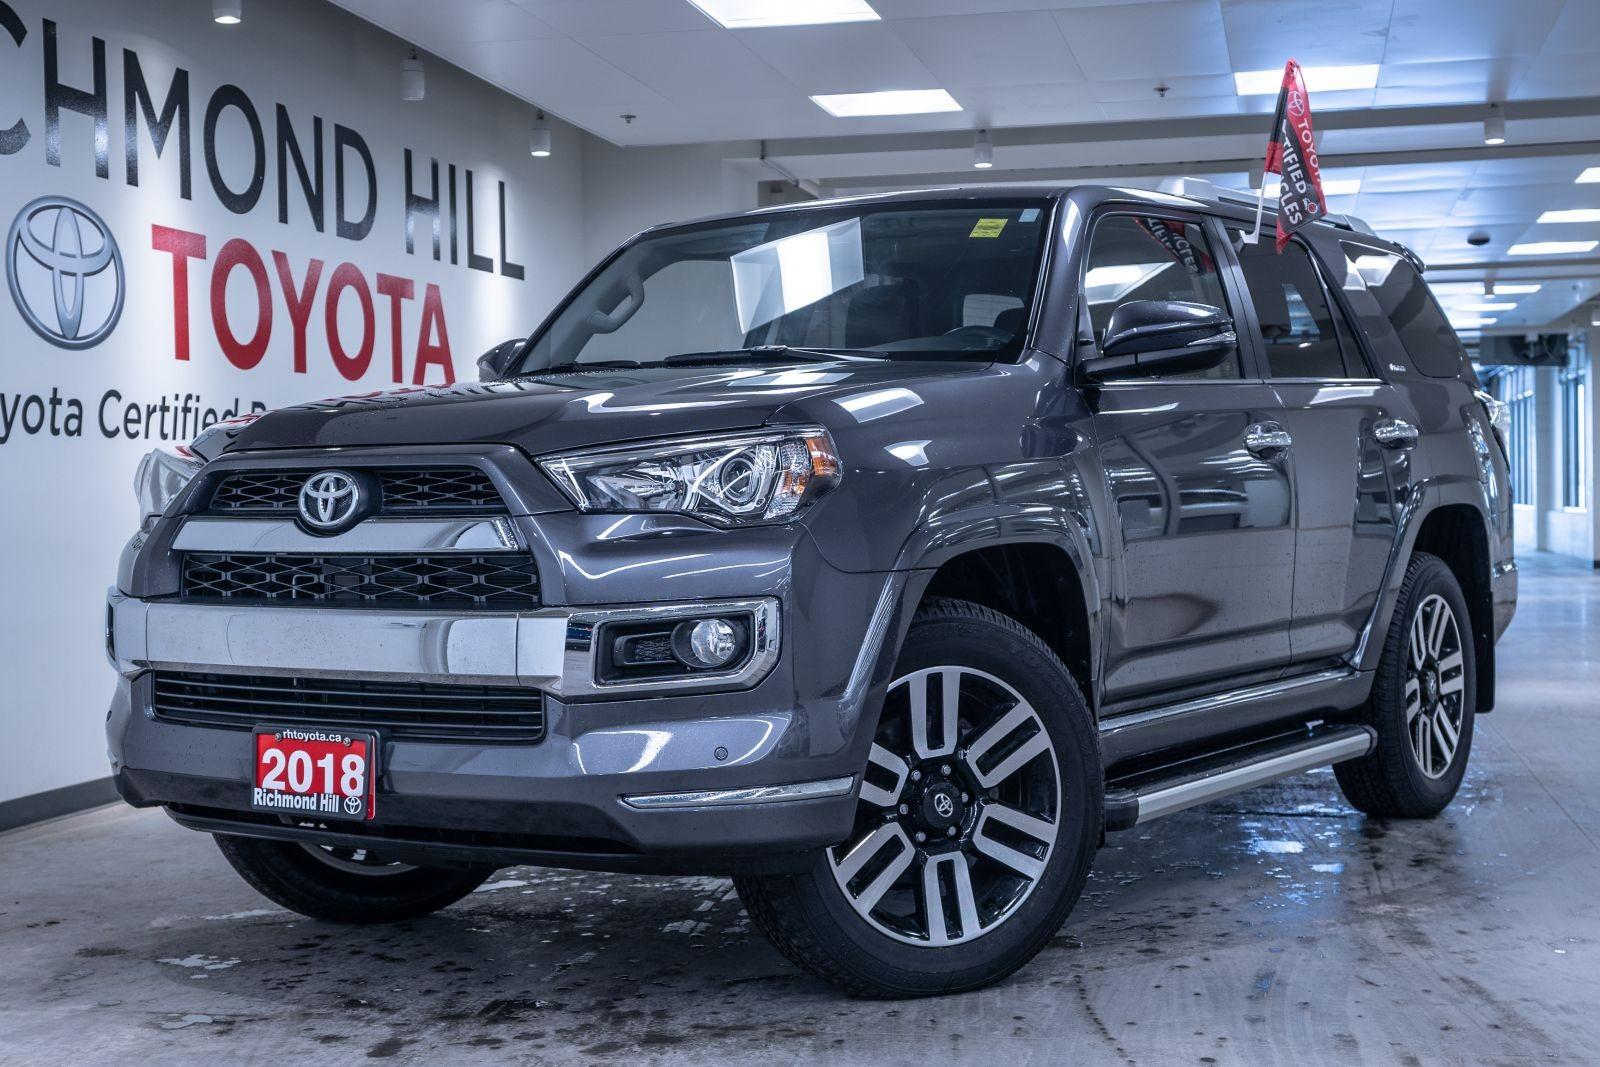 Richmond Hill Toyota   Inventory